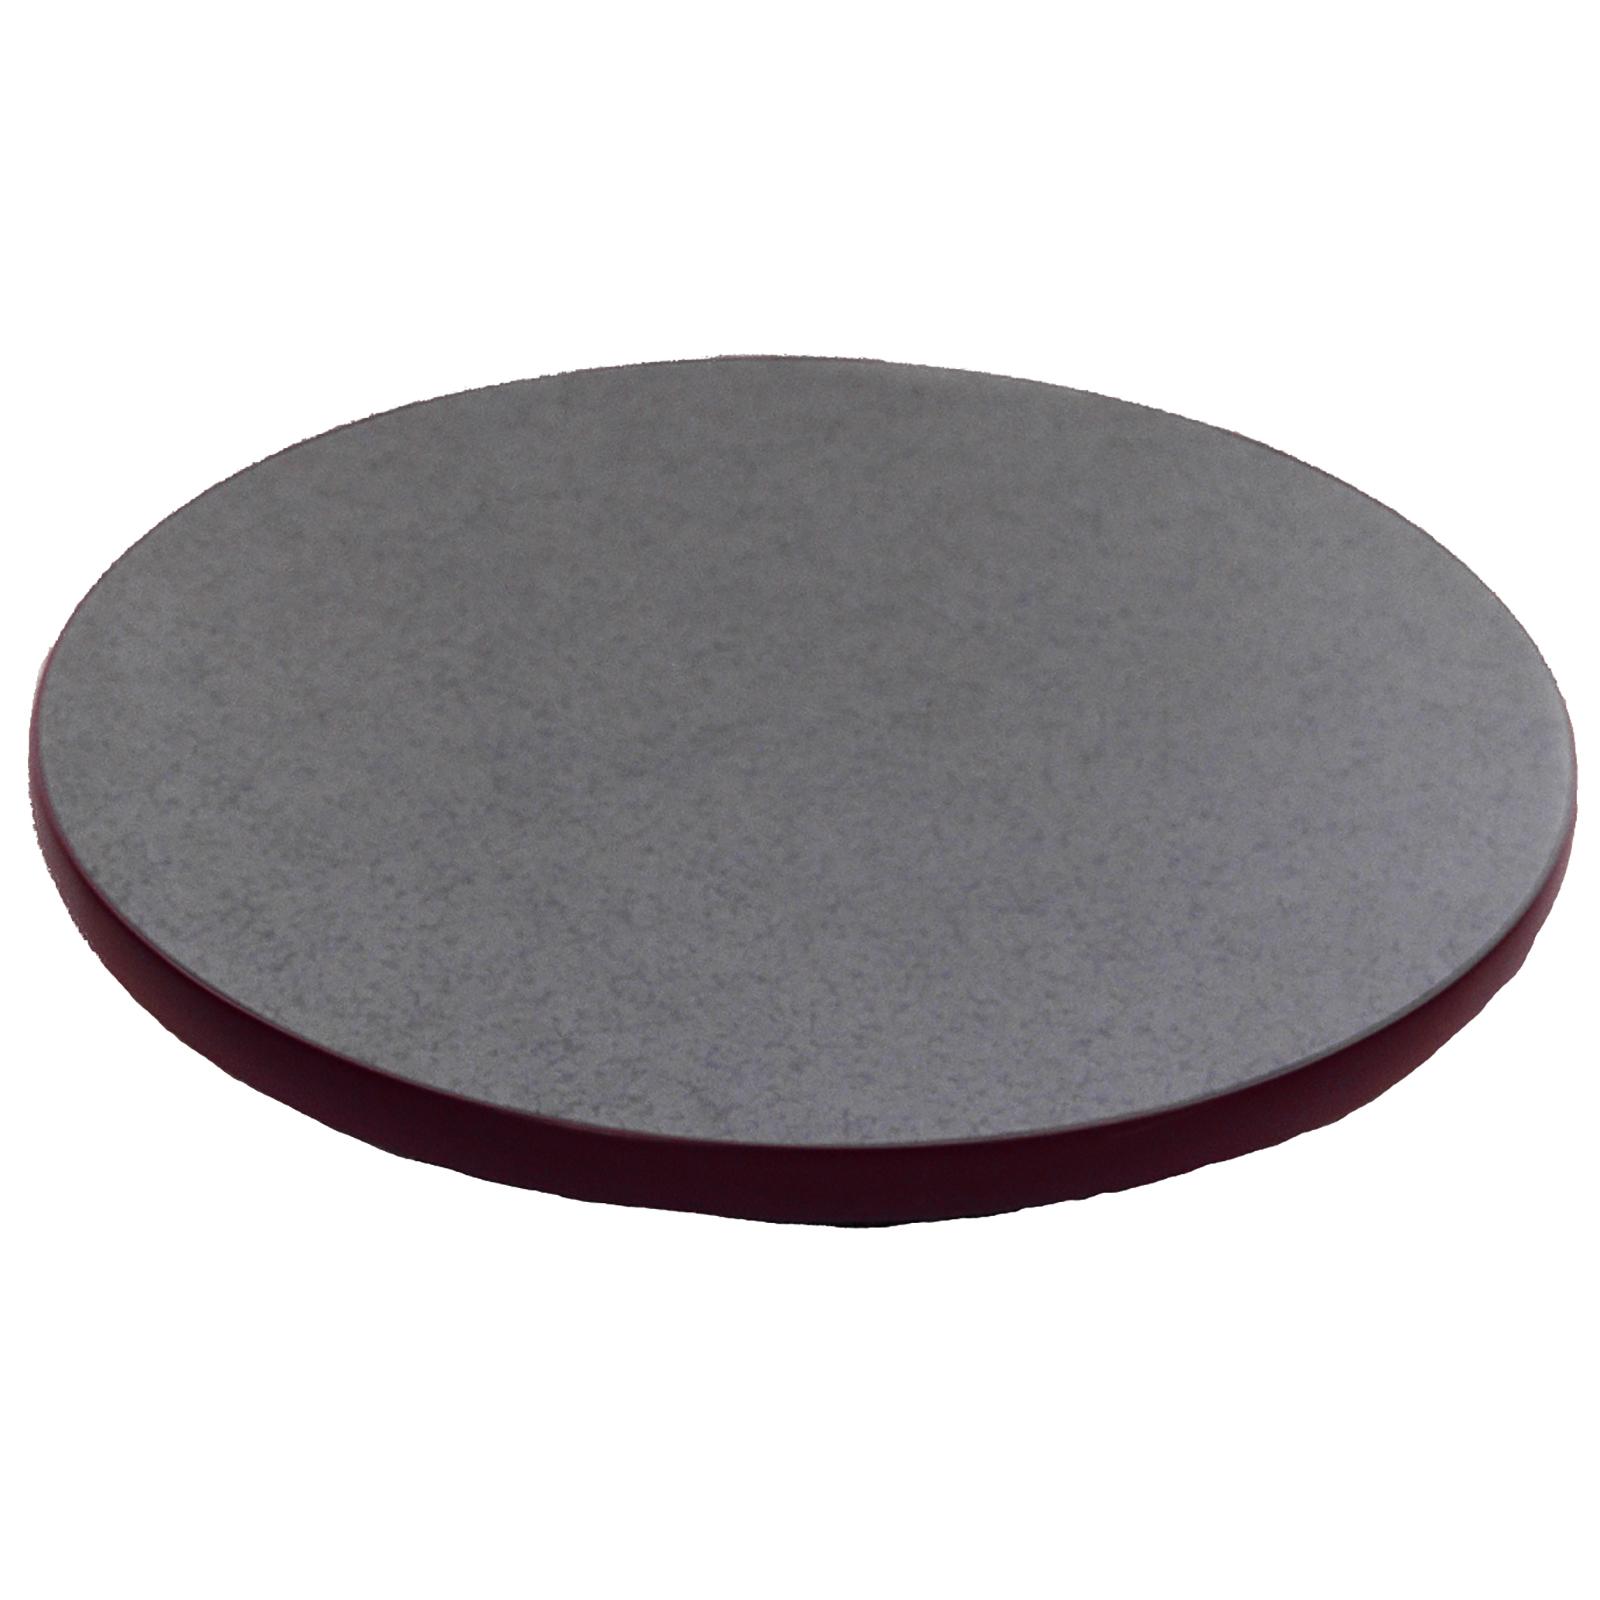 Oak Street CTM2460-2 table top, laminate